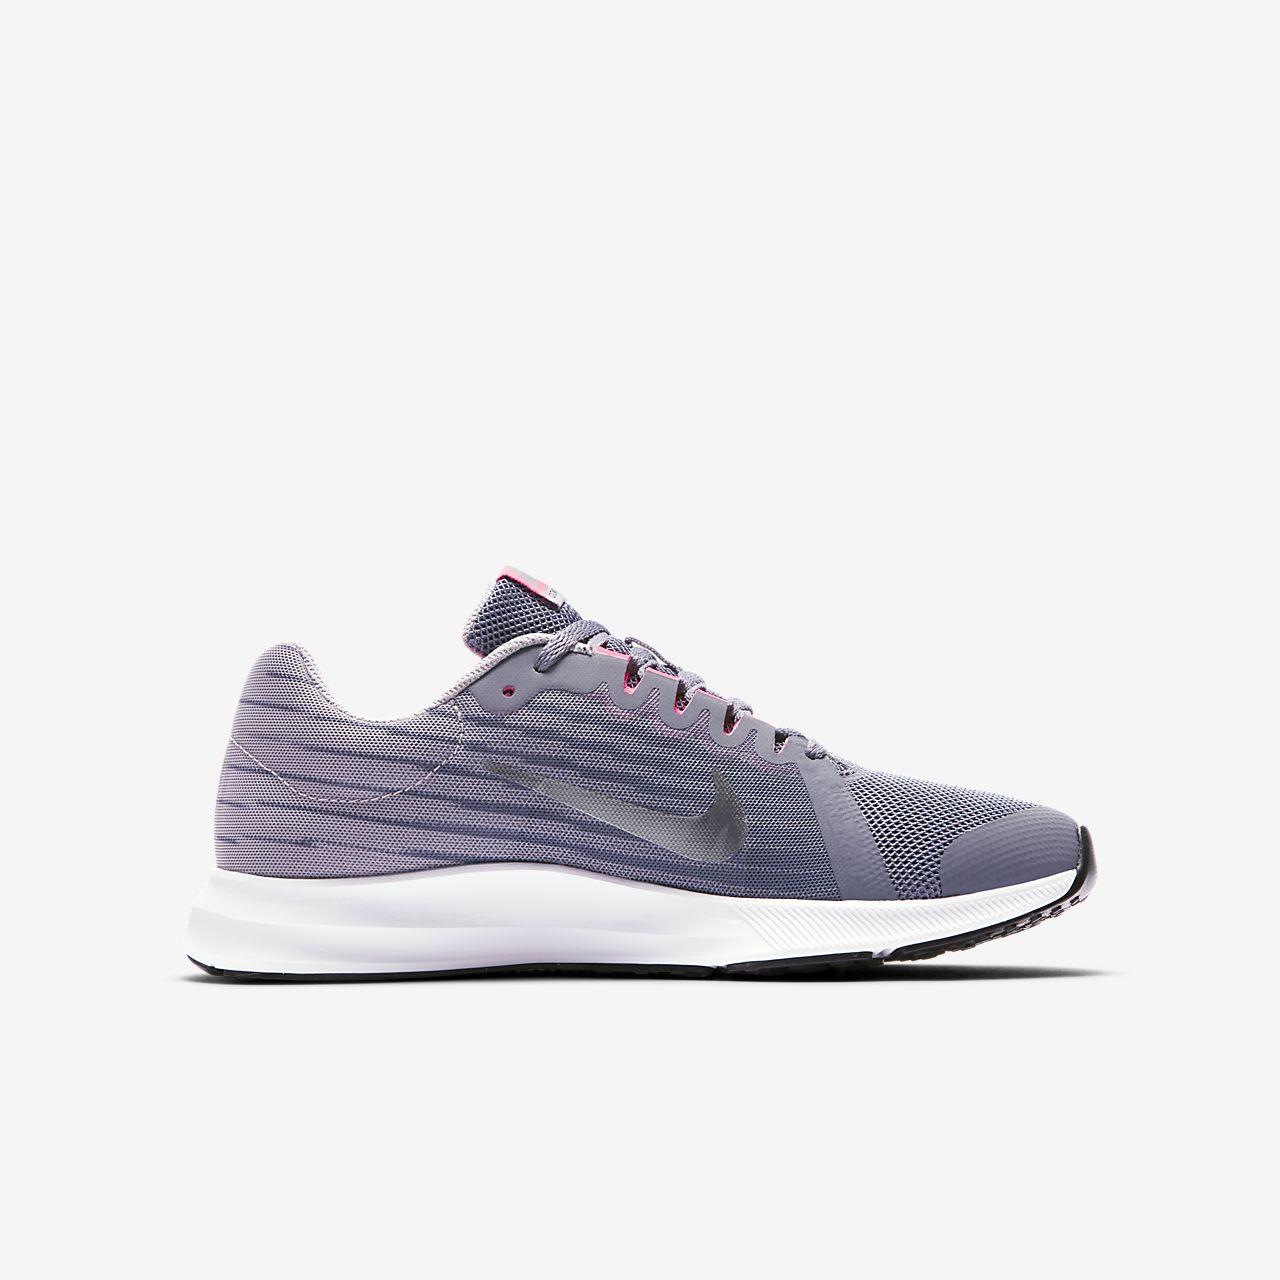 ... Nike Downshifter 8 Older Kids' Running Shoe